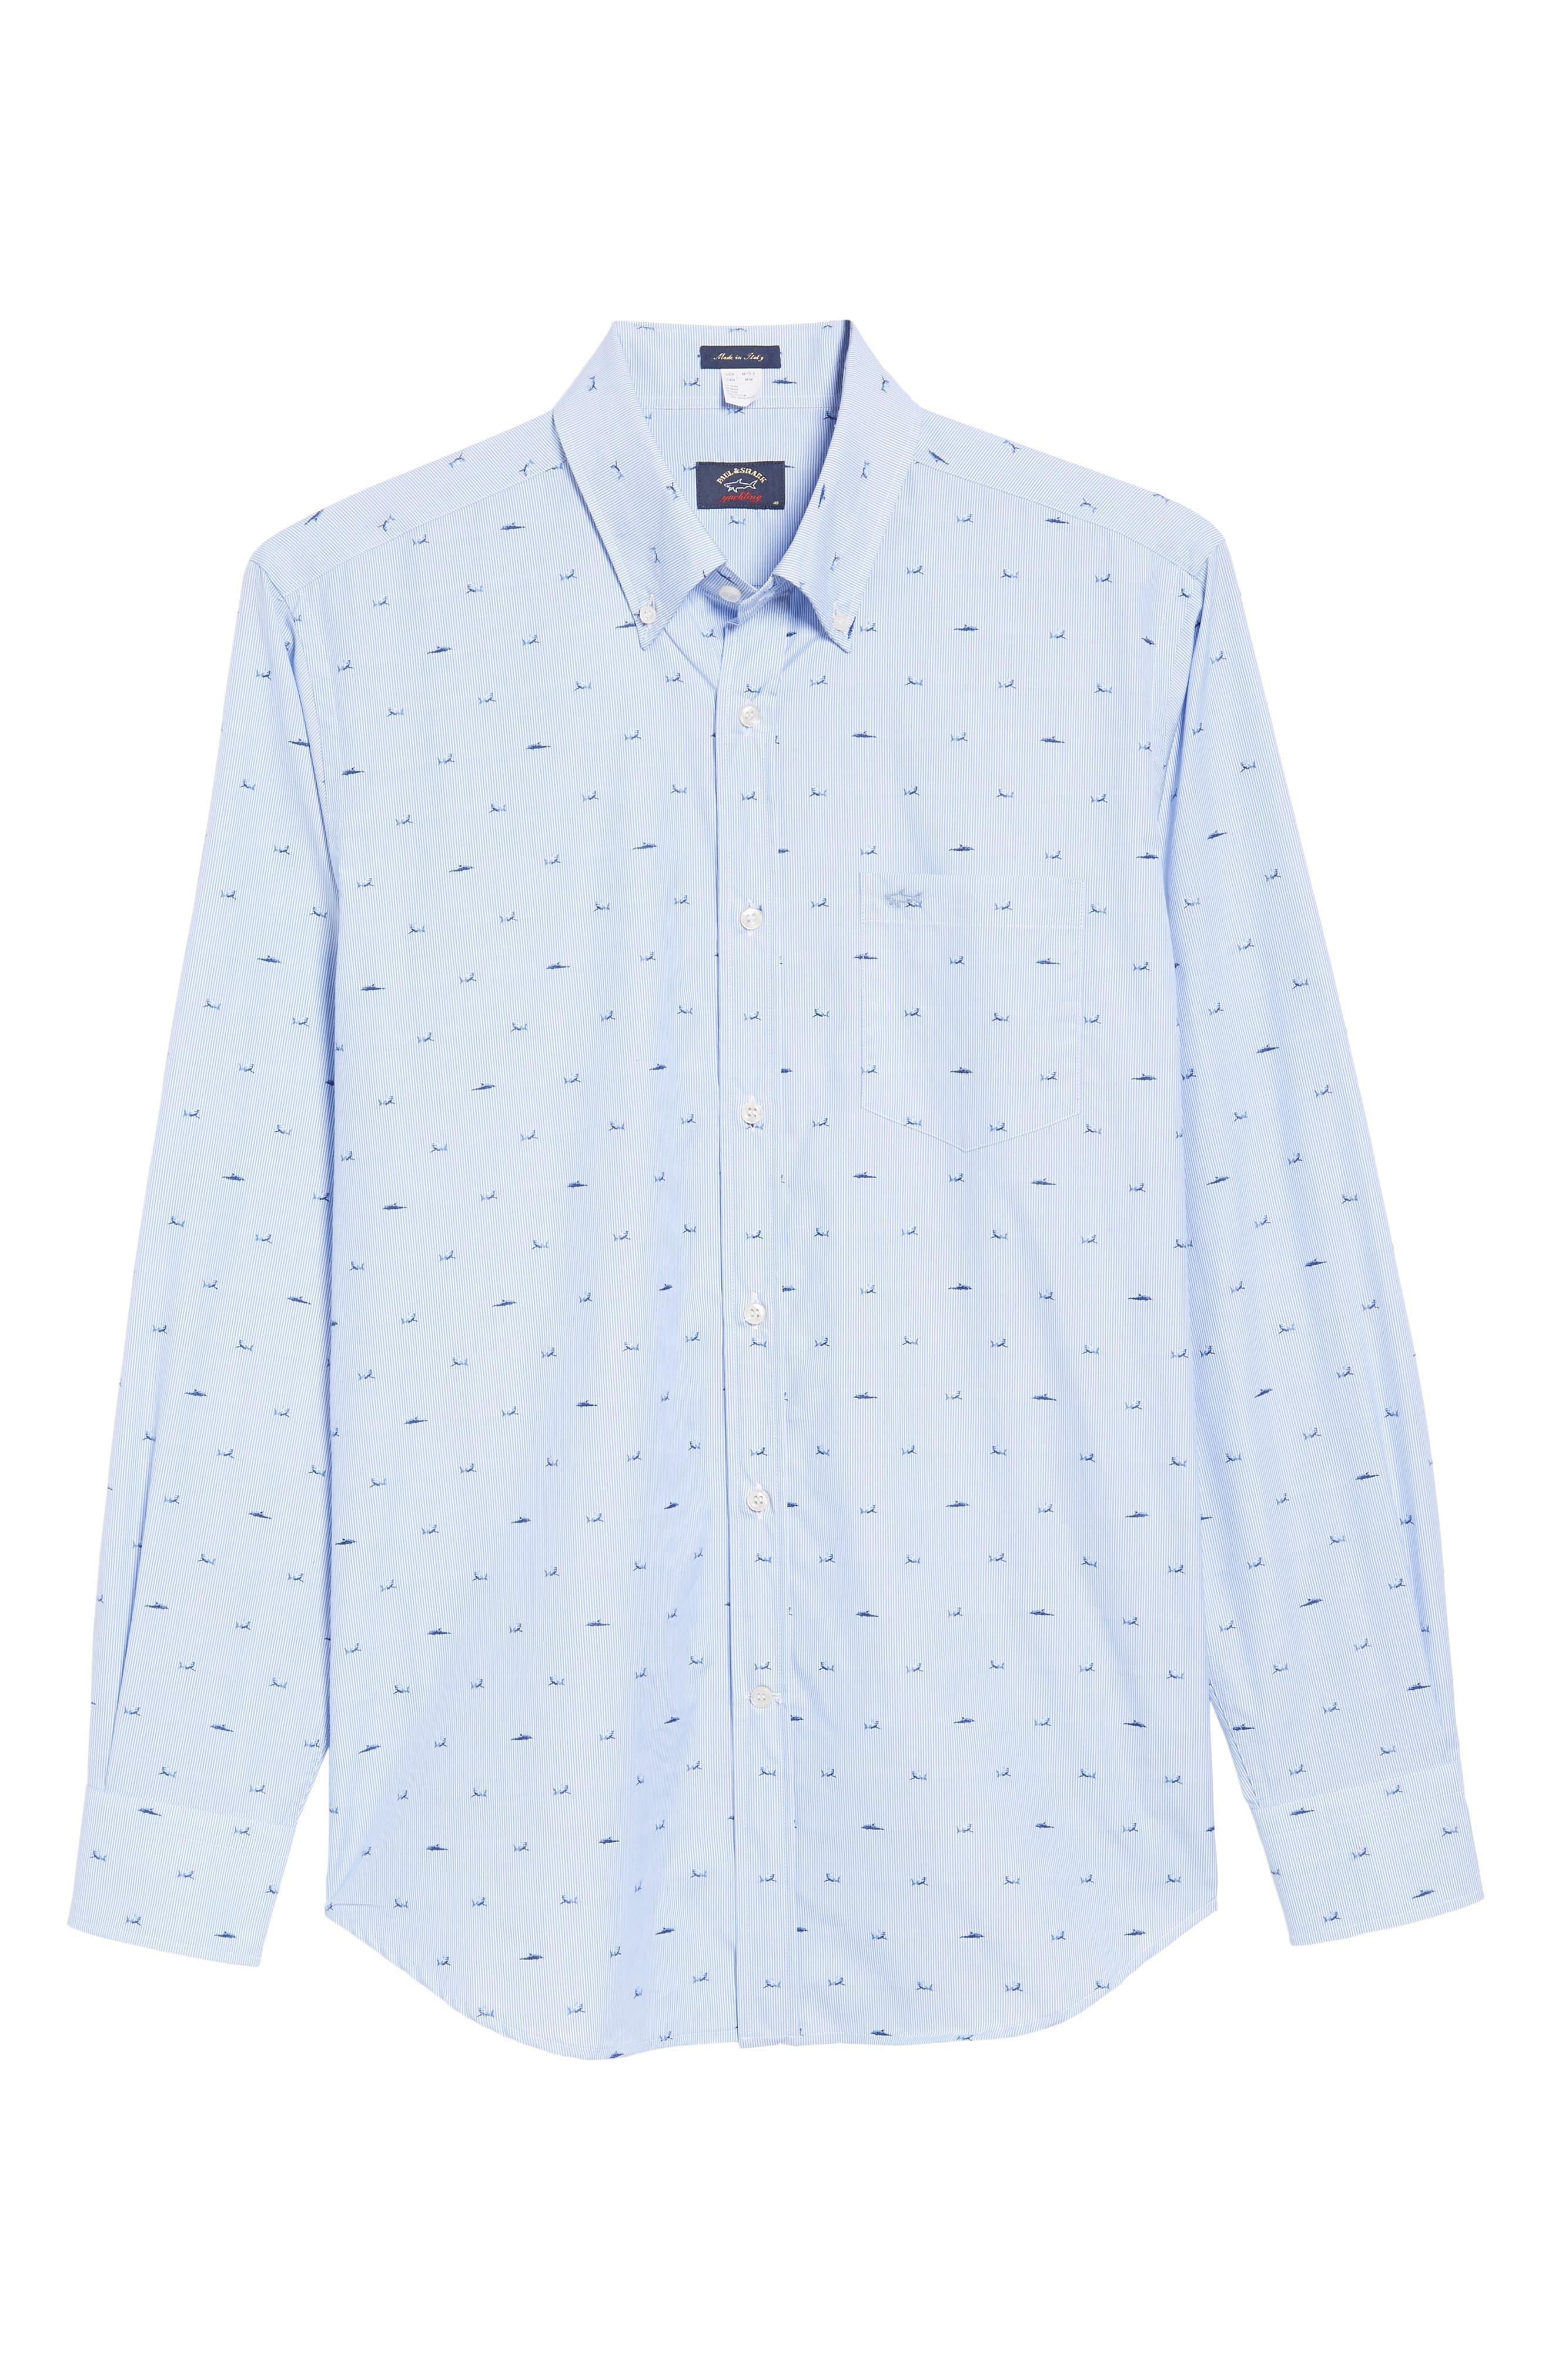 Paul&Shark Great White Jacquard Sport Shirt,                             Alternate thumbnail 6, color,                             Blue